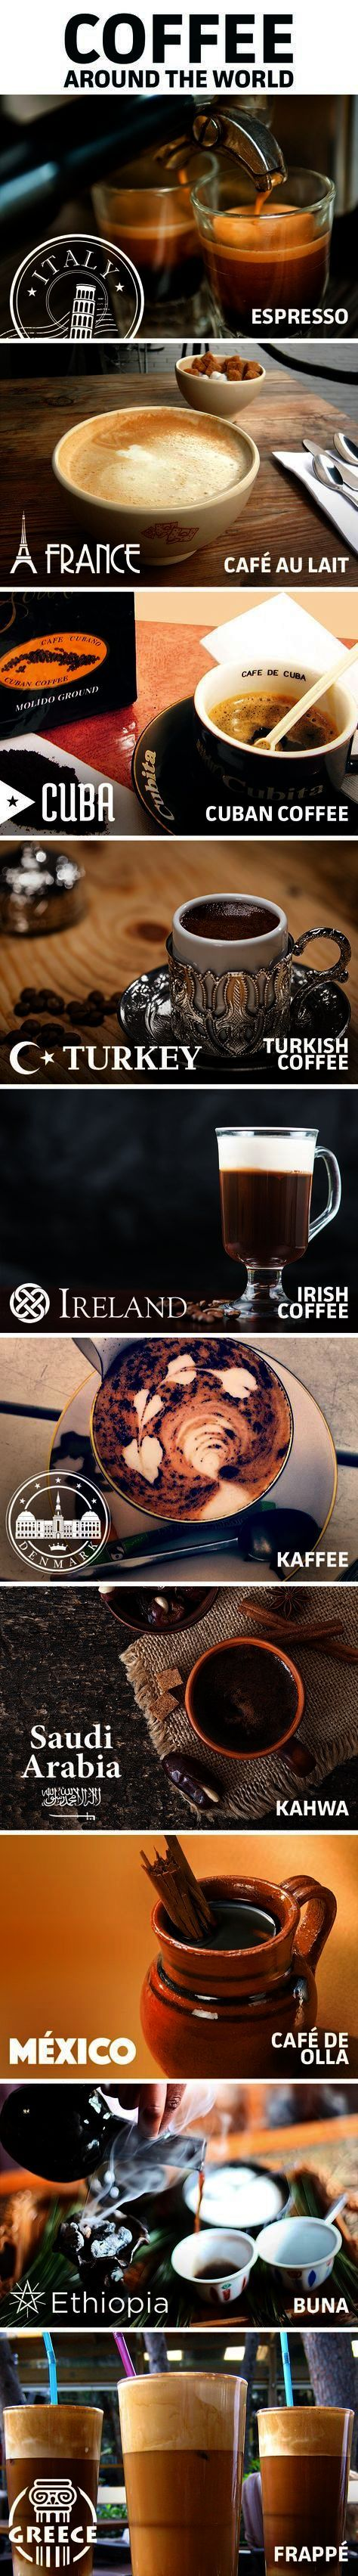 Stunning - Cup Of Coffee Caffeine Vs Coke #pinterest ...